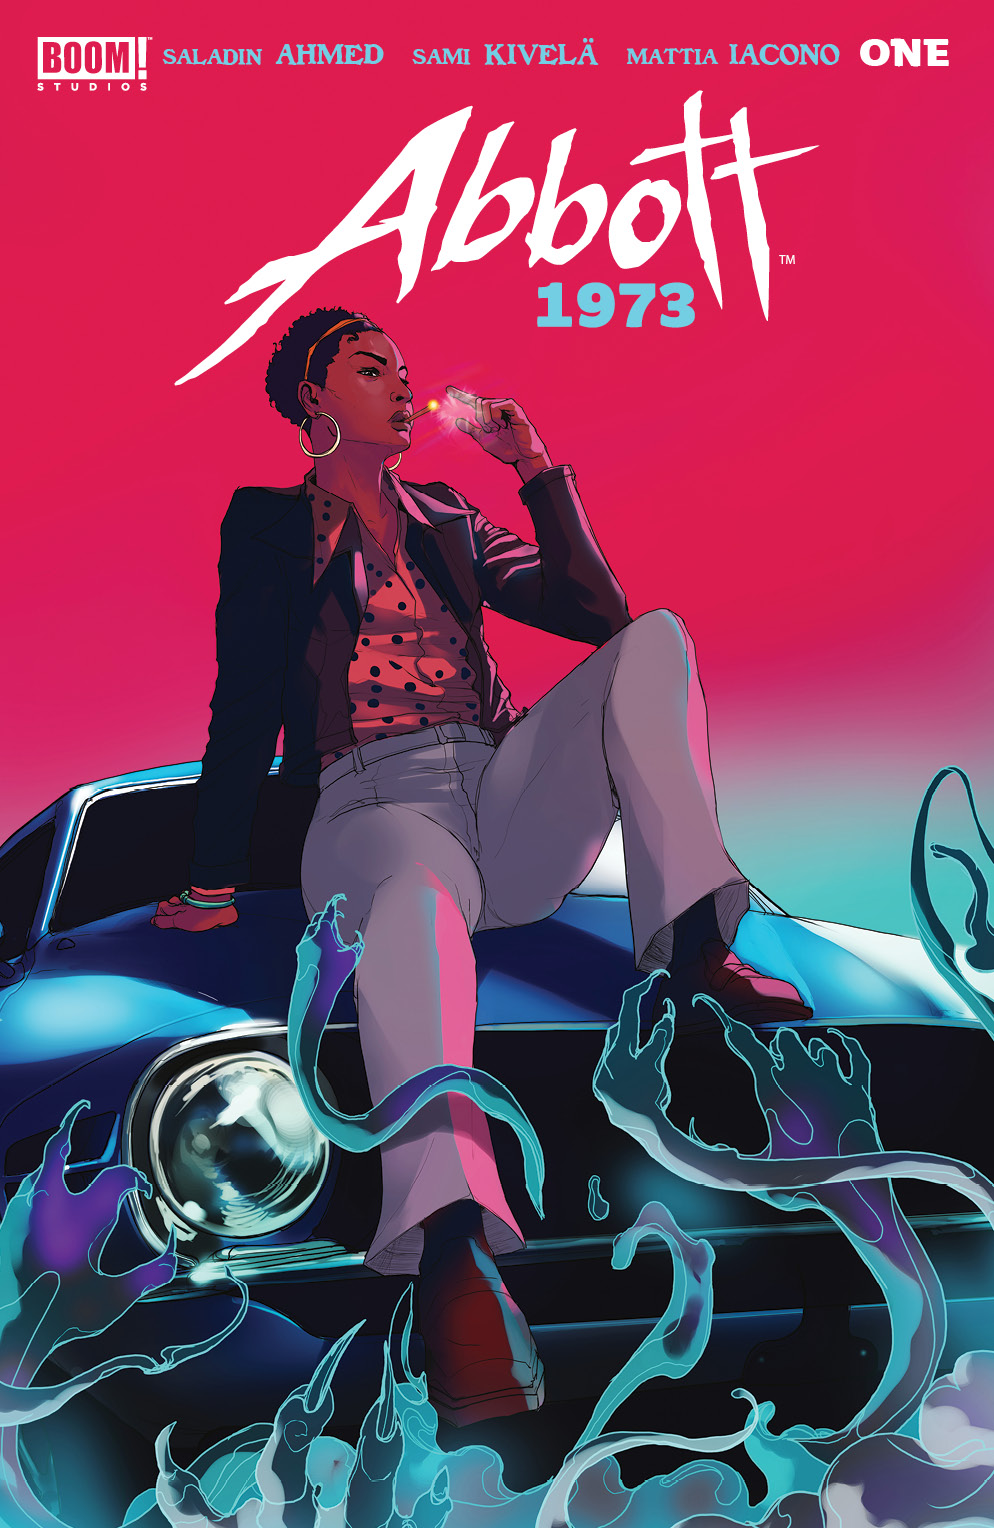 Abbott_1973_001_Cover_A_Main ComicList: BOOM! Studios New Releases for 01/20/2021